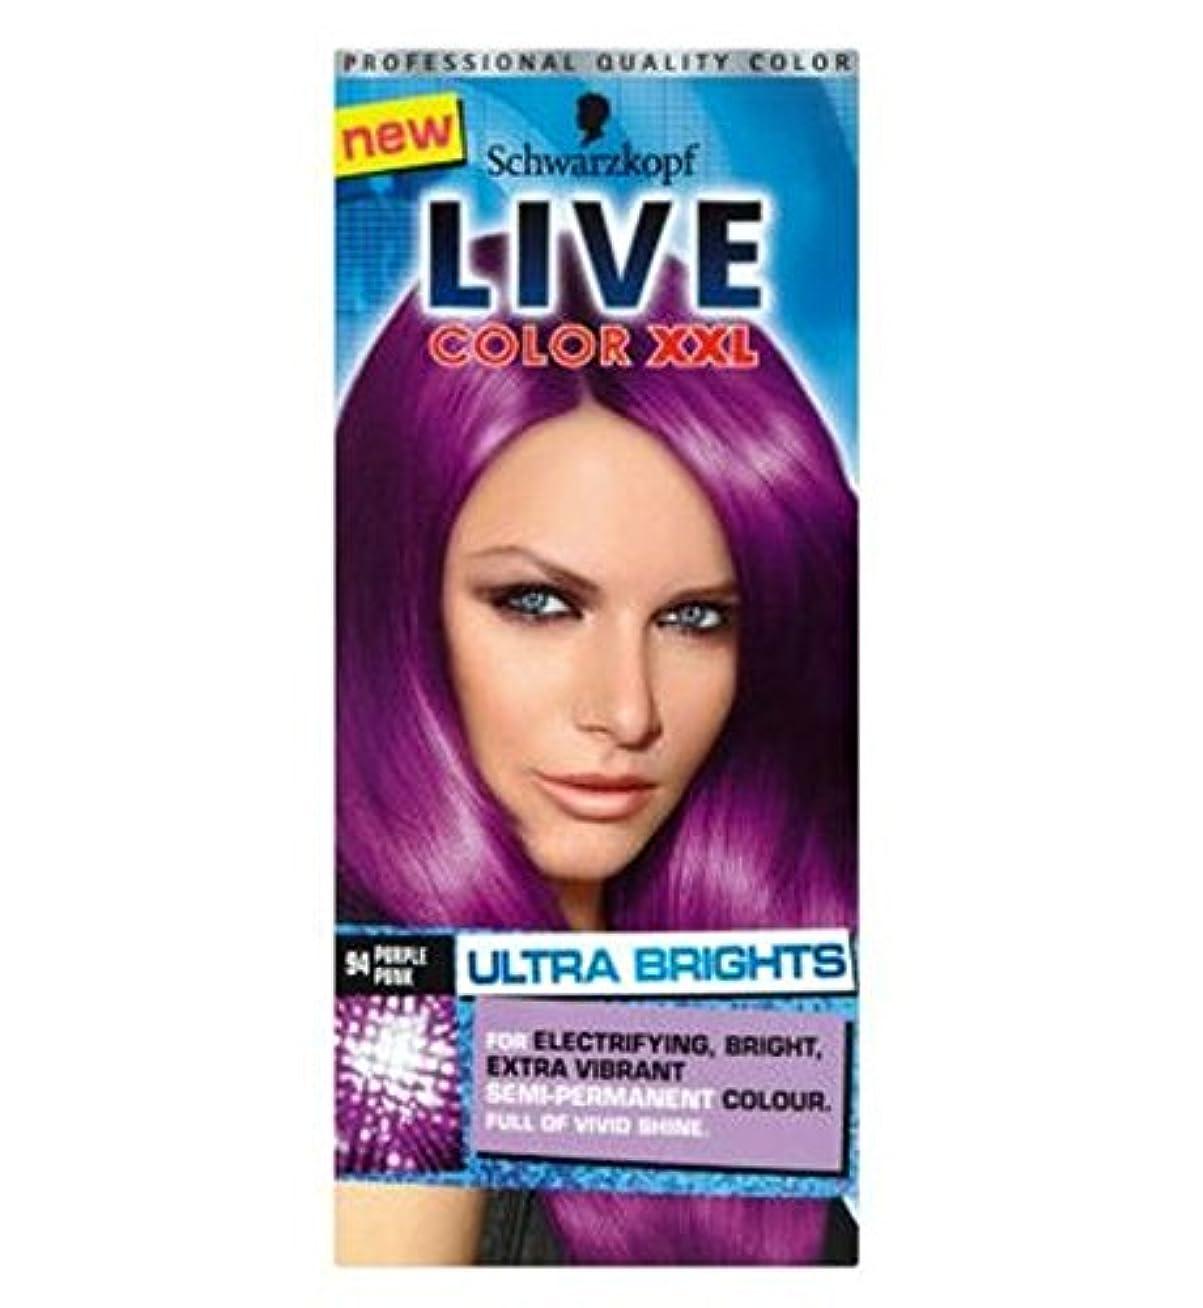 Schwarzkopf LIVE Color XXL Ultra Brights 94 Purple Punk Semi-Permanent Purple Hair Dye - シュワルツコフライブカラーXxl超輝94紫...